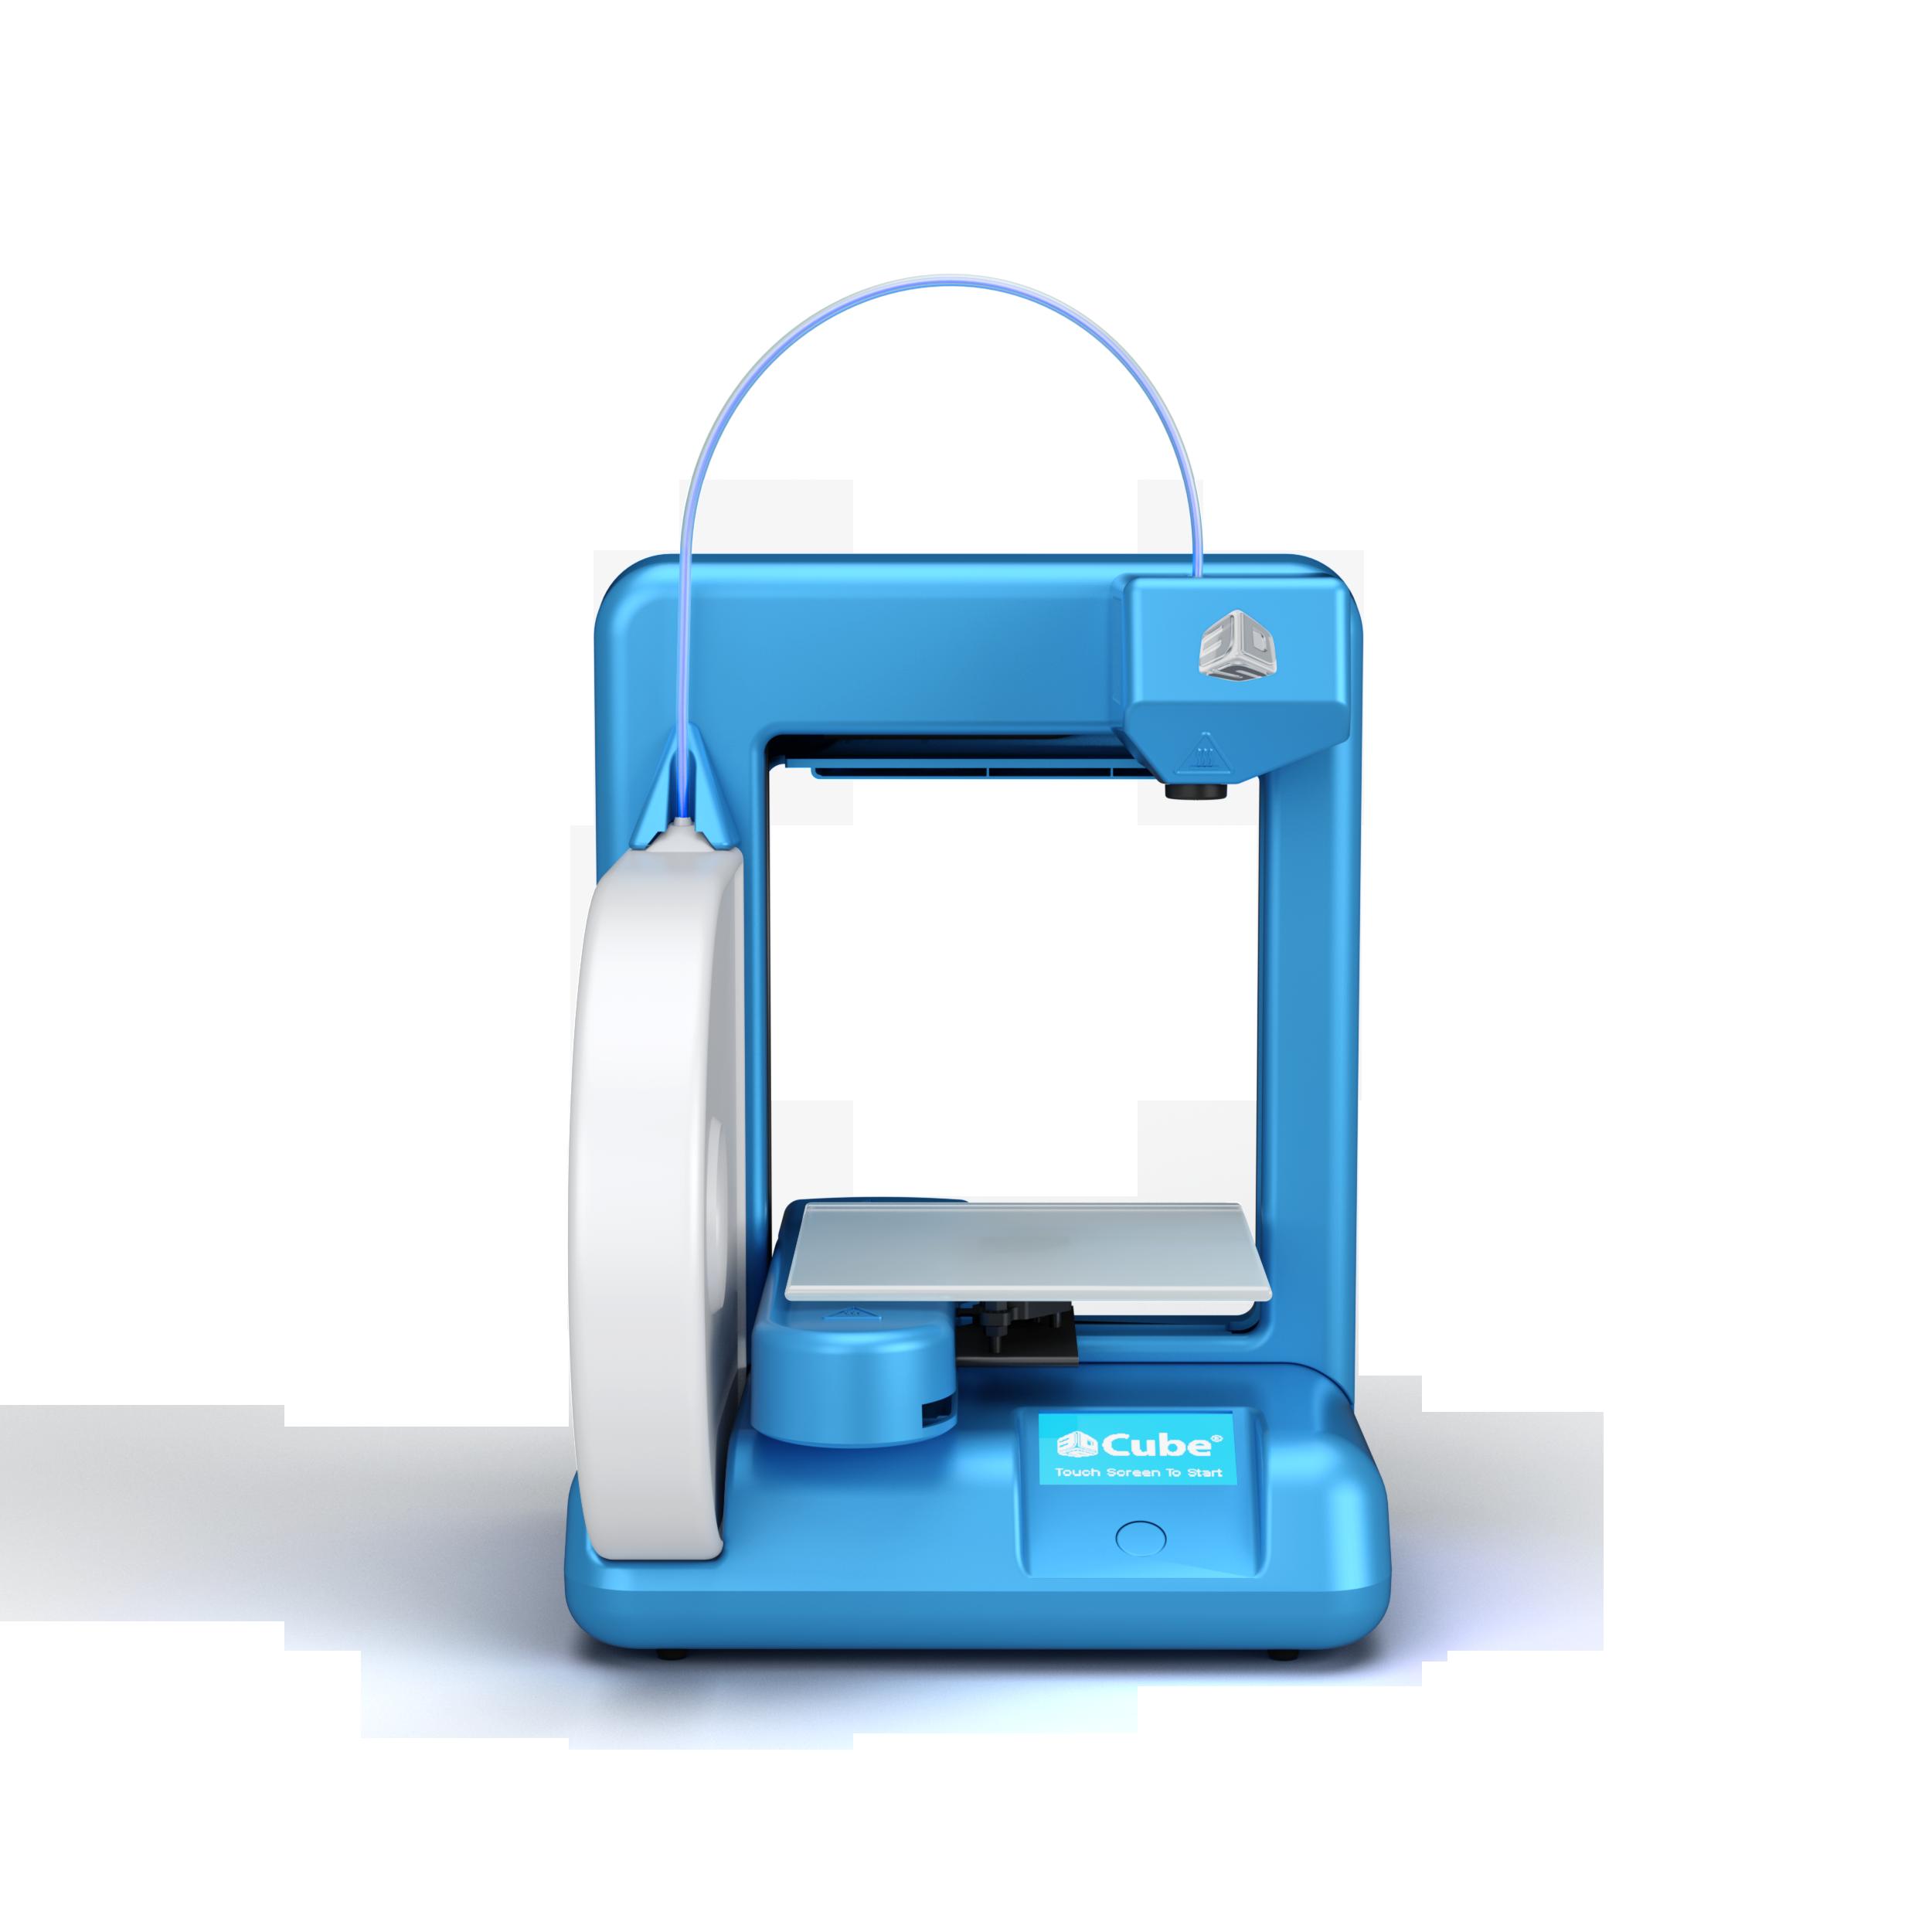 Blue Cube2 3D printer